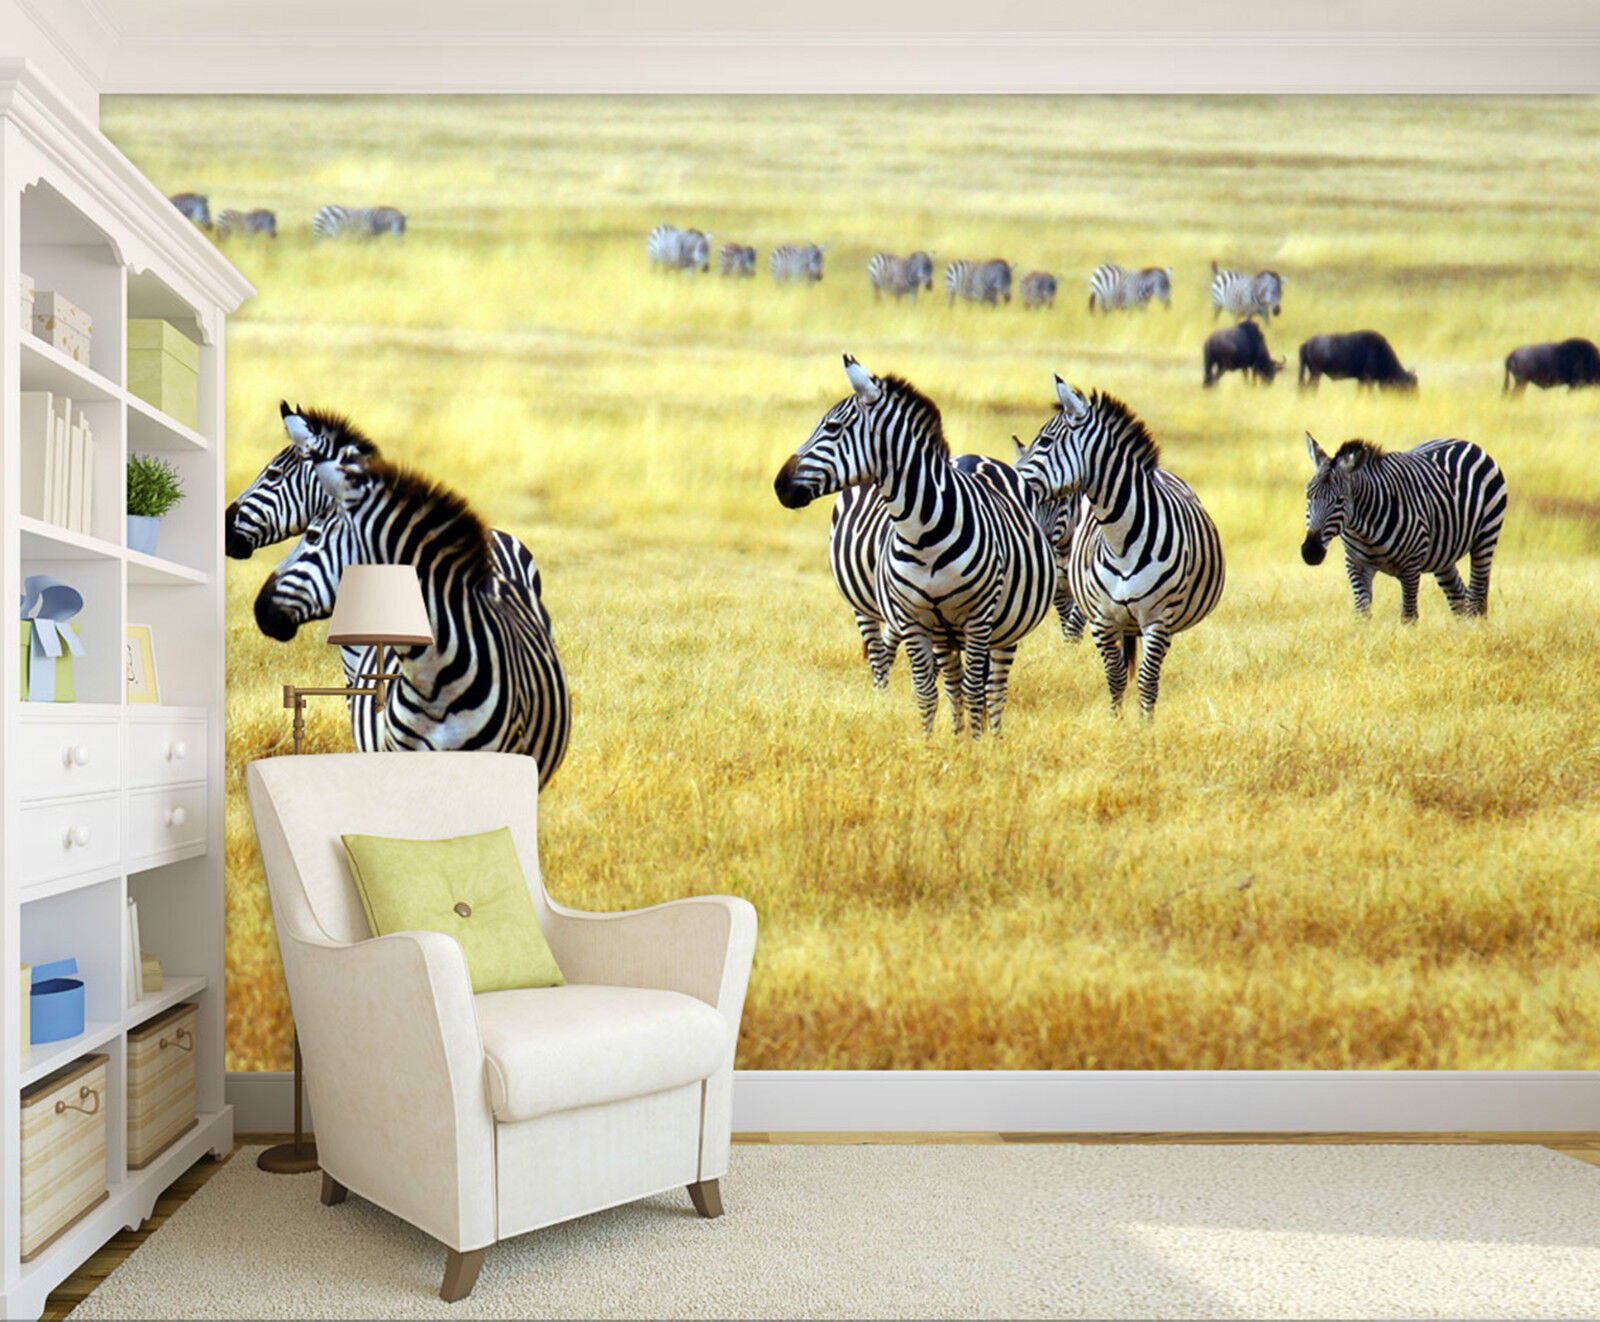 3D Grasland 4655 Fototapeten Wandbild Fototapete Bild Tapete Familie Kinder DE